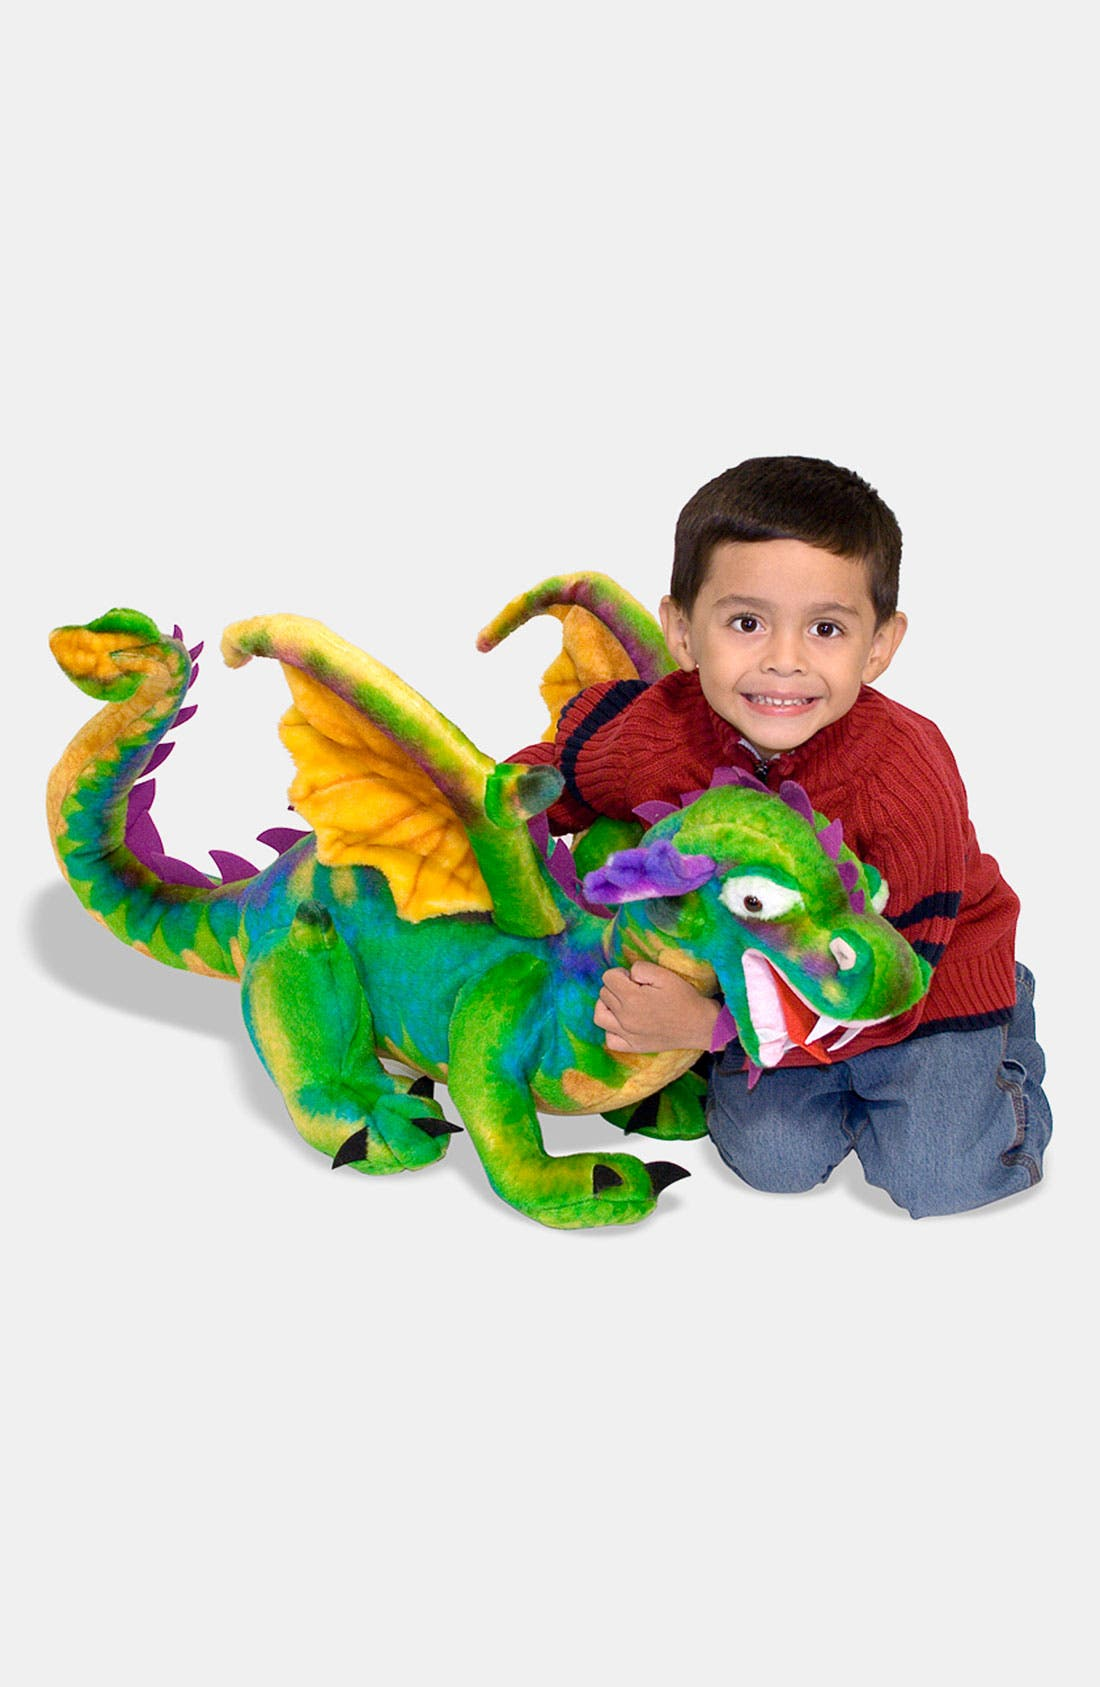 Main Image - Melissa & Doug Oversized Plush Stuffed Dragon